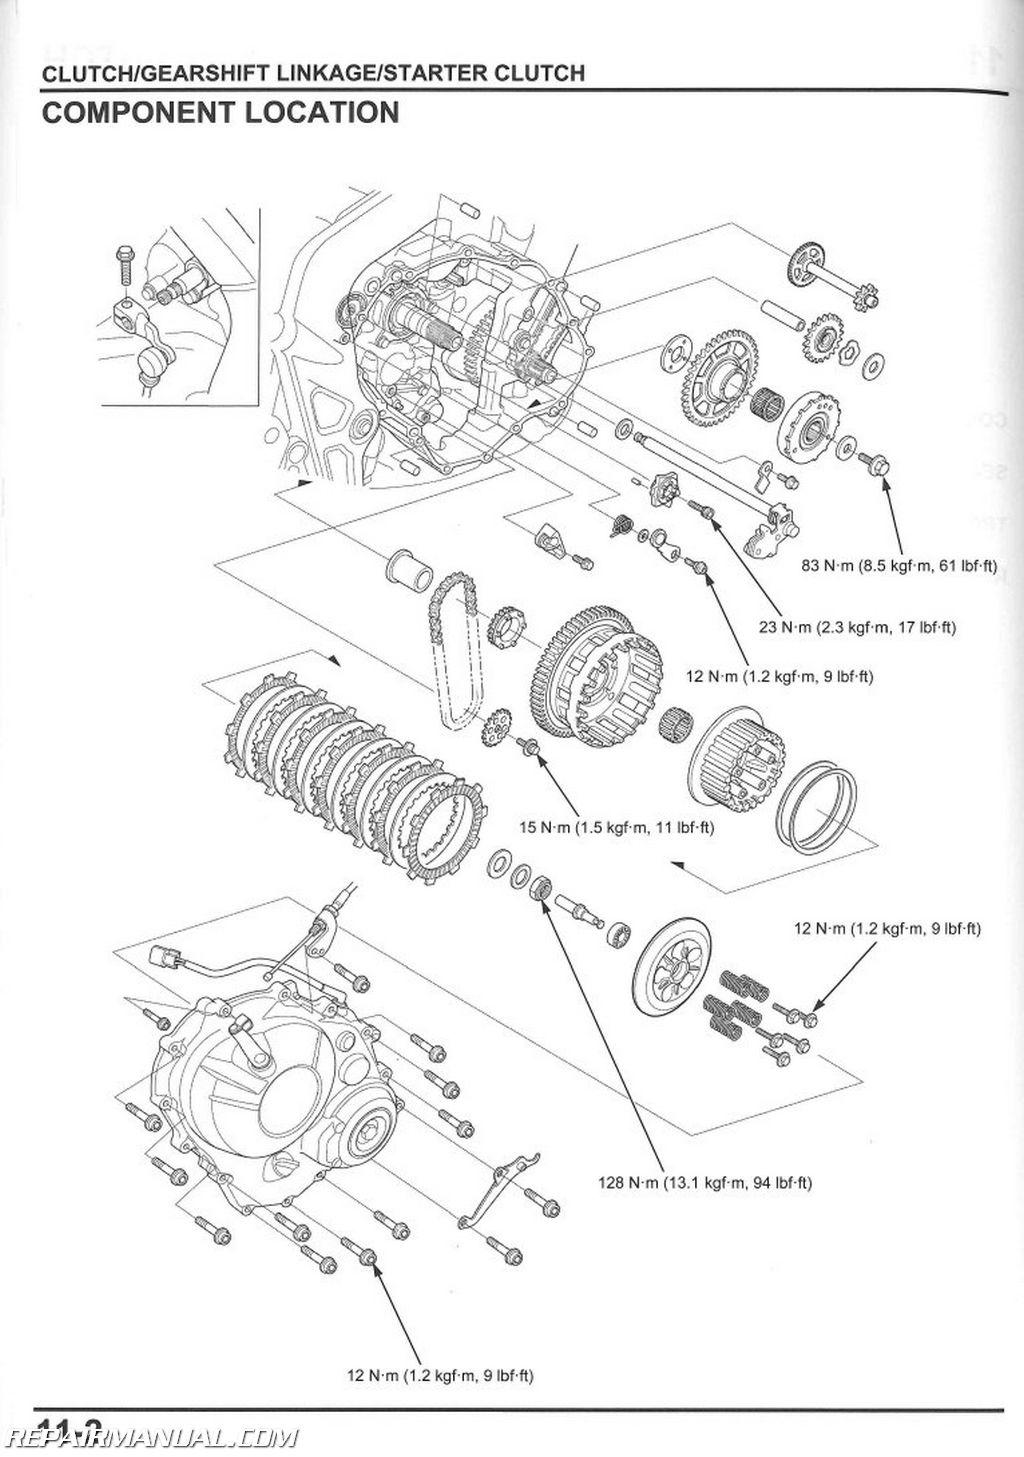 hondacbr650fabsservicewiring diagram